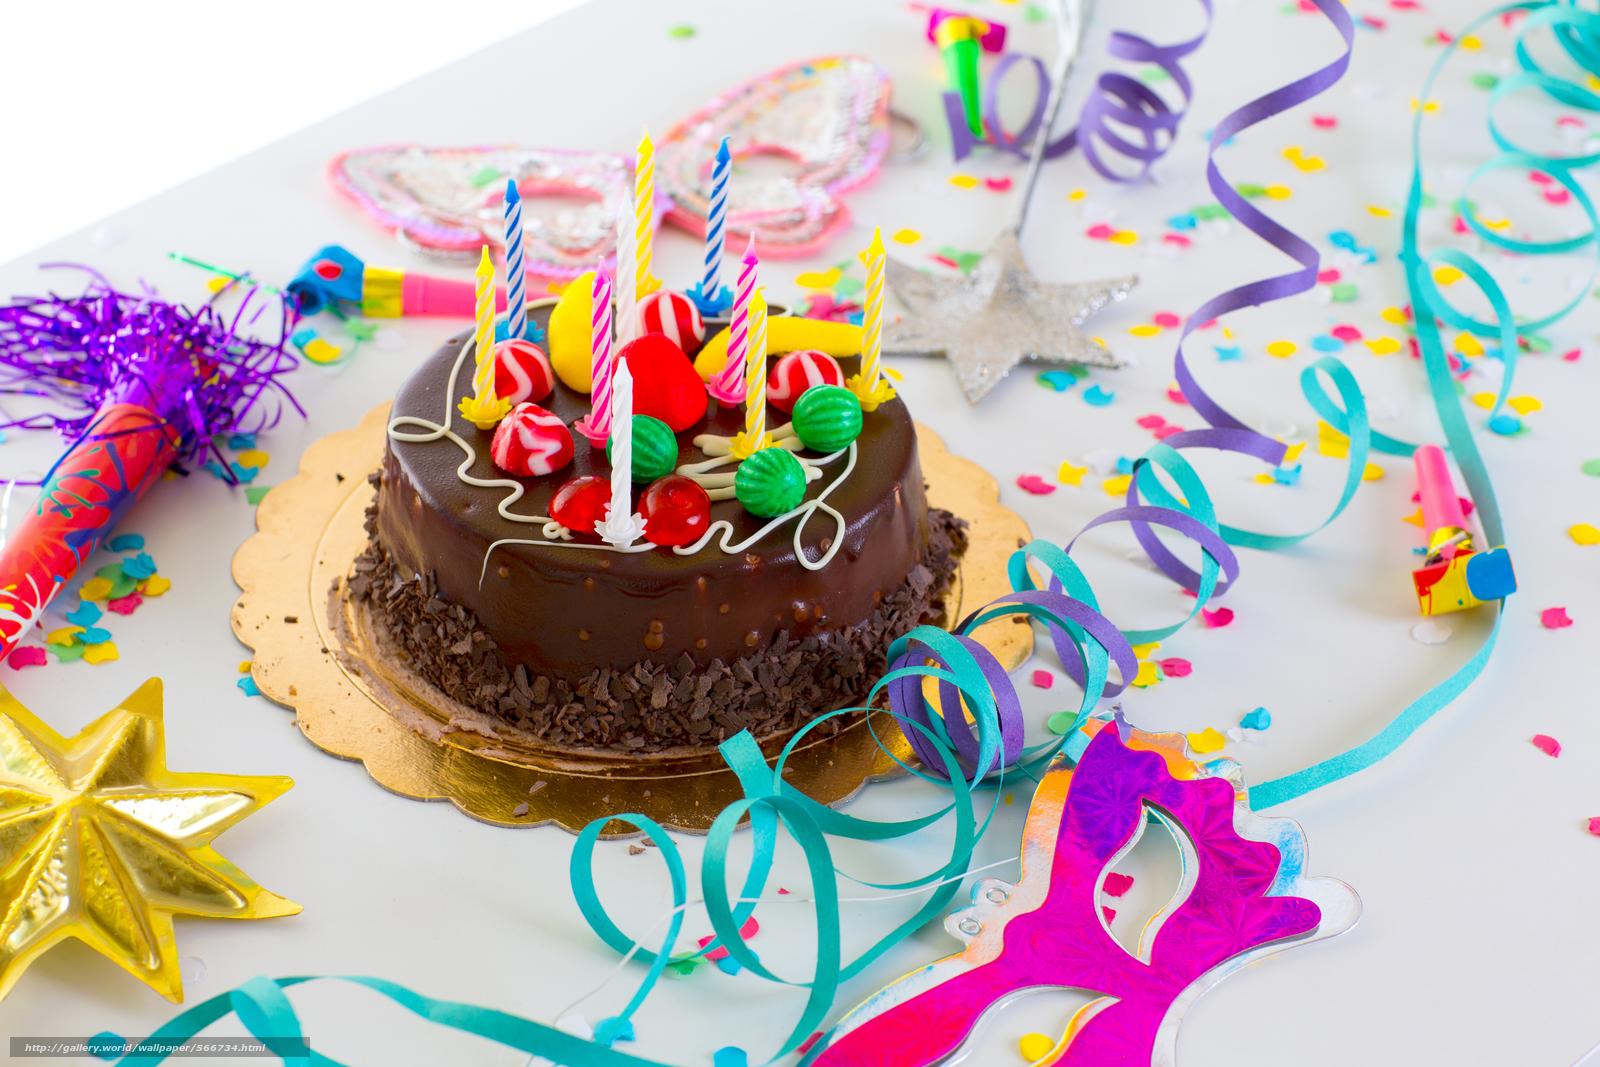 tlcharger fond d 39 ecran bougies joyeux anniversaire serpentin g teau fonds d 39 ecran gratuits. Black Bedroom Furniture Sets. Home Design Ideas